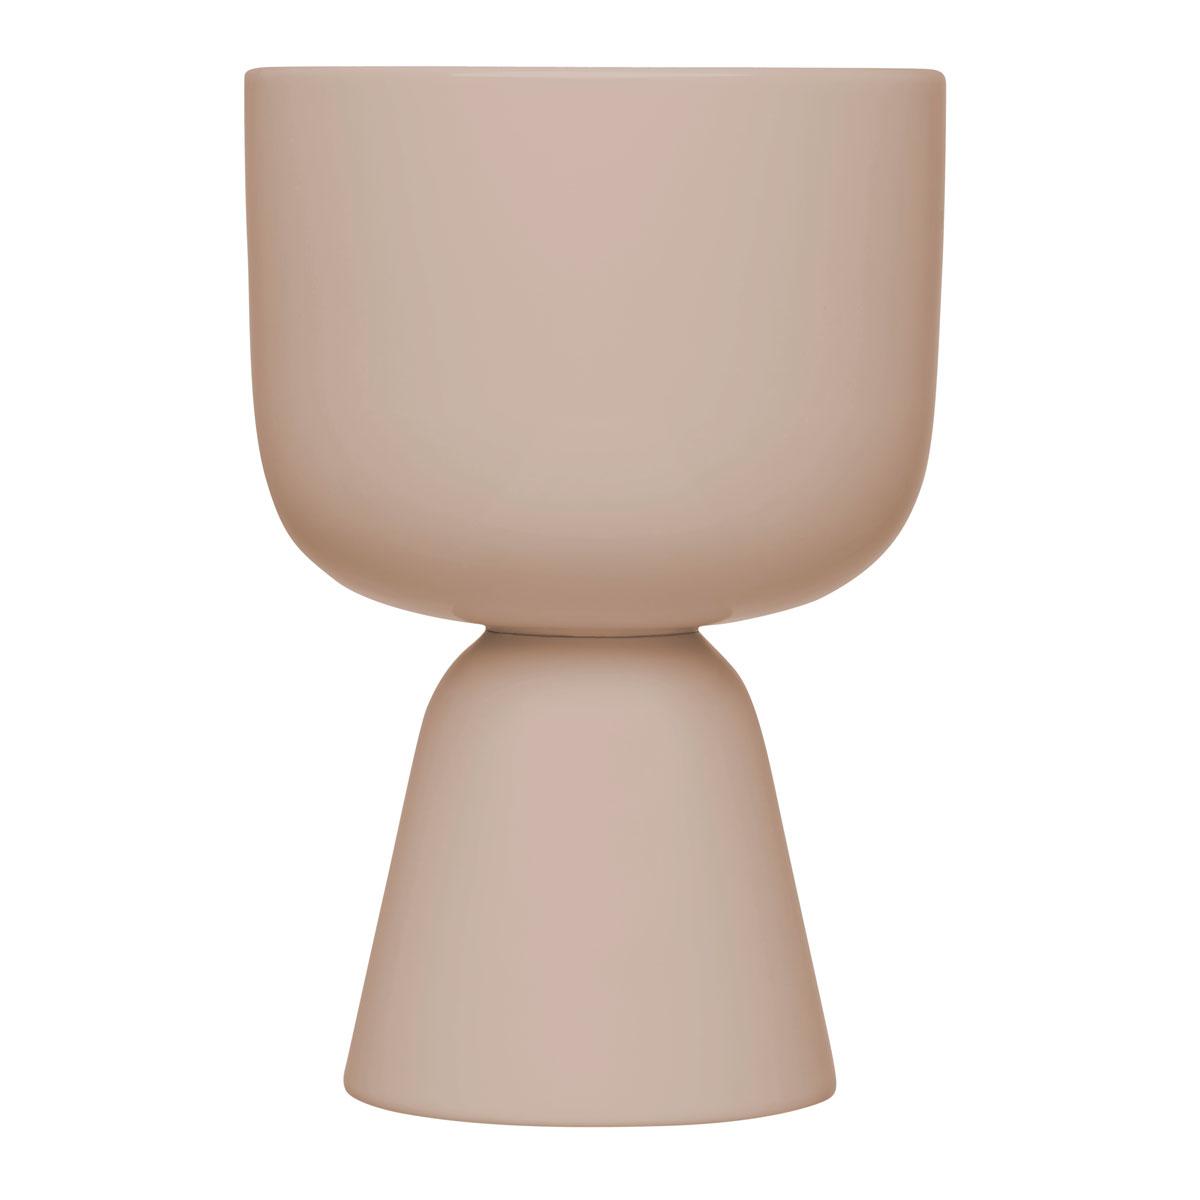 "Iittala Nappula Plant Pot 9x6"" Beige"